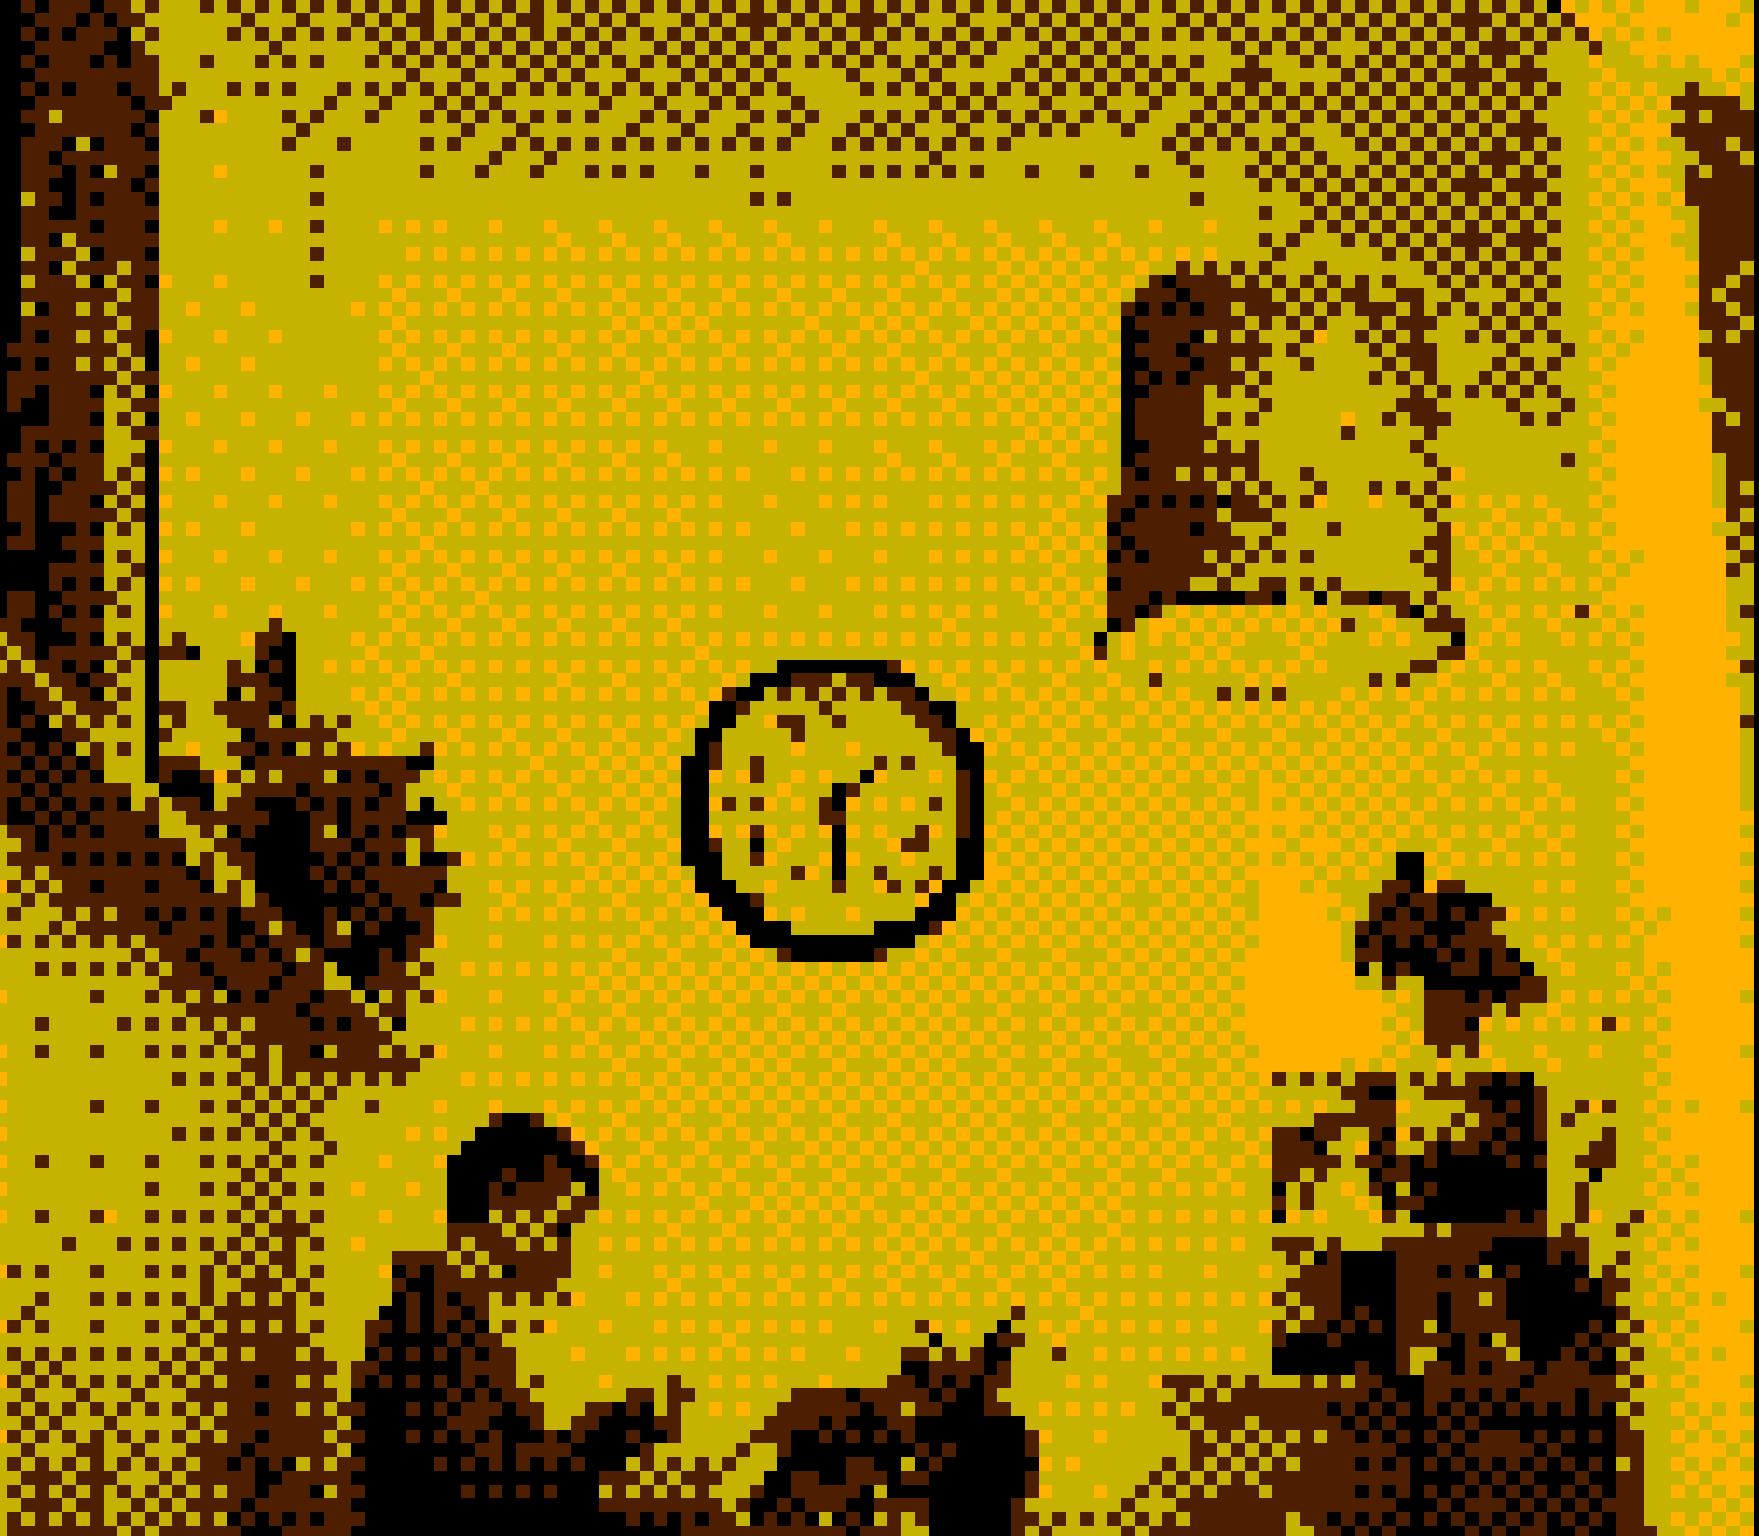 Game Boy Photo office